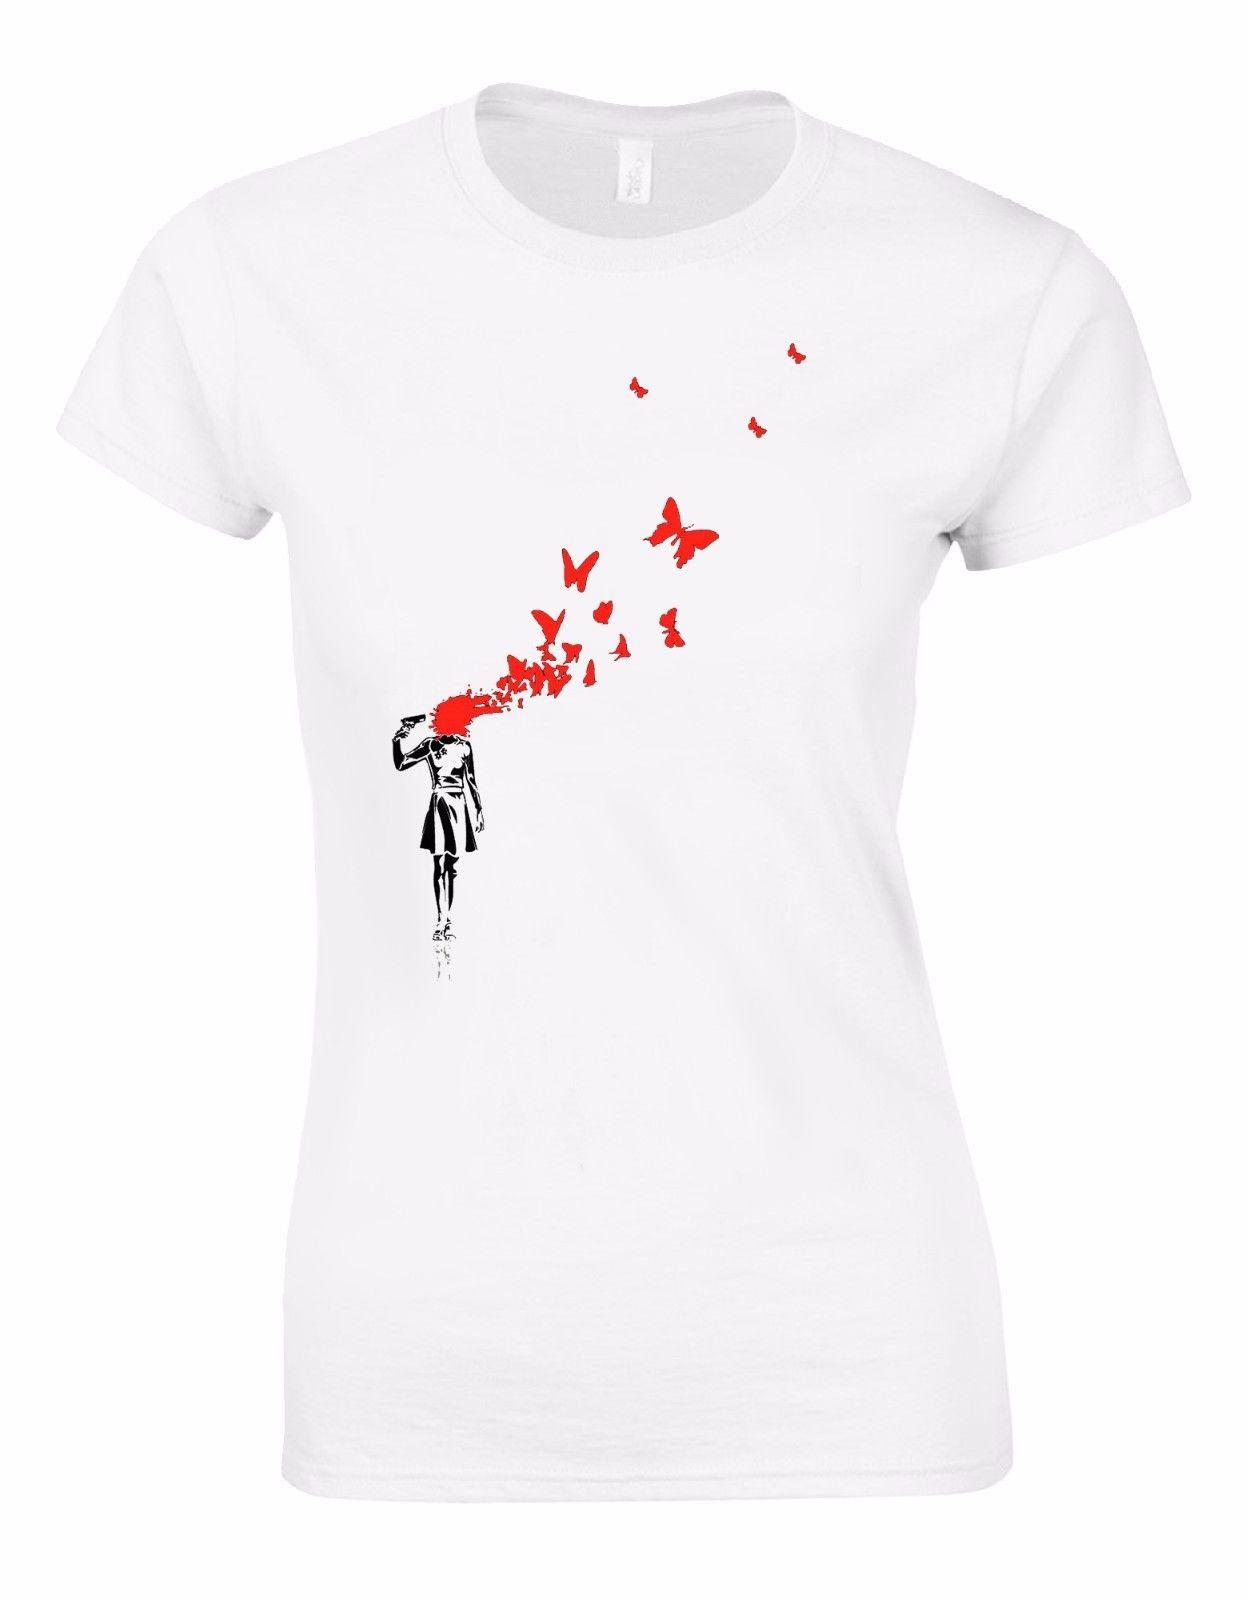 Banksy Girl Blowing Brains Out Red Butterflies Street Art Woman Tshirt AL97